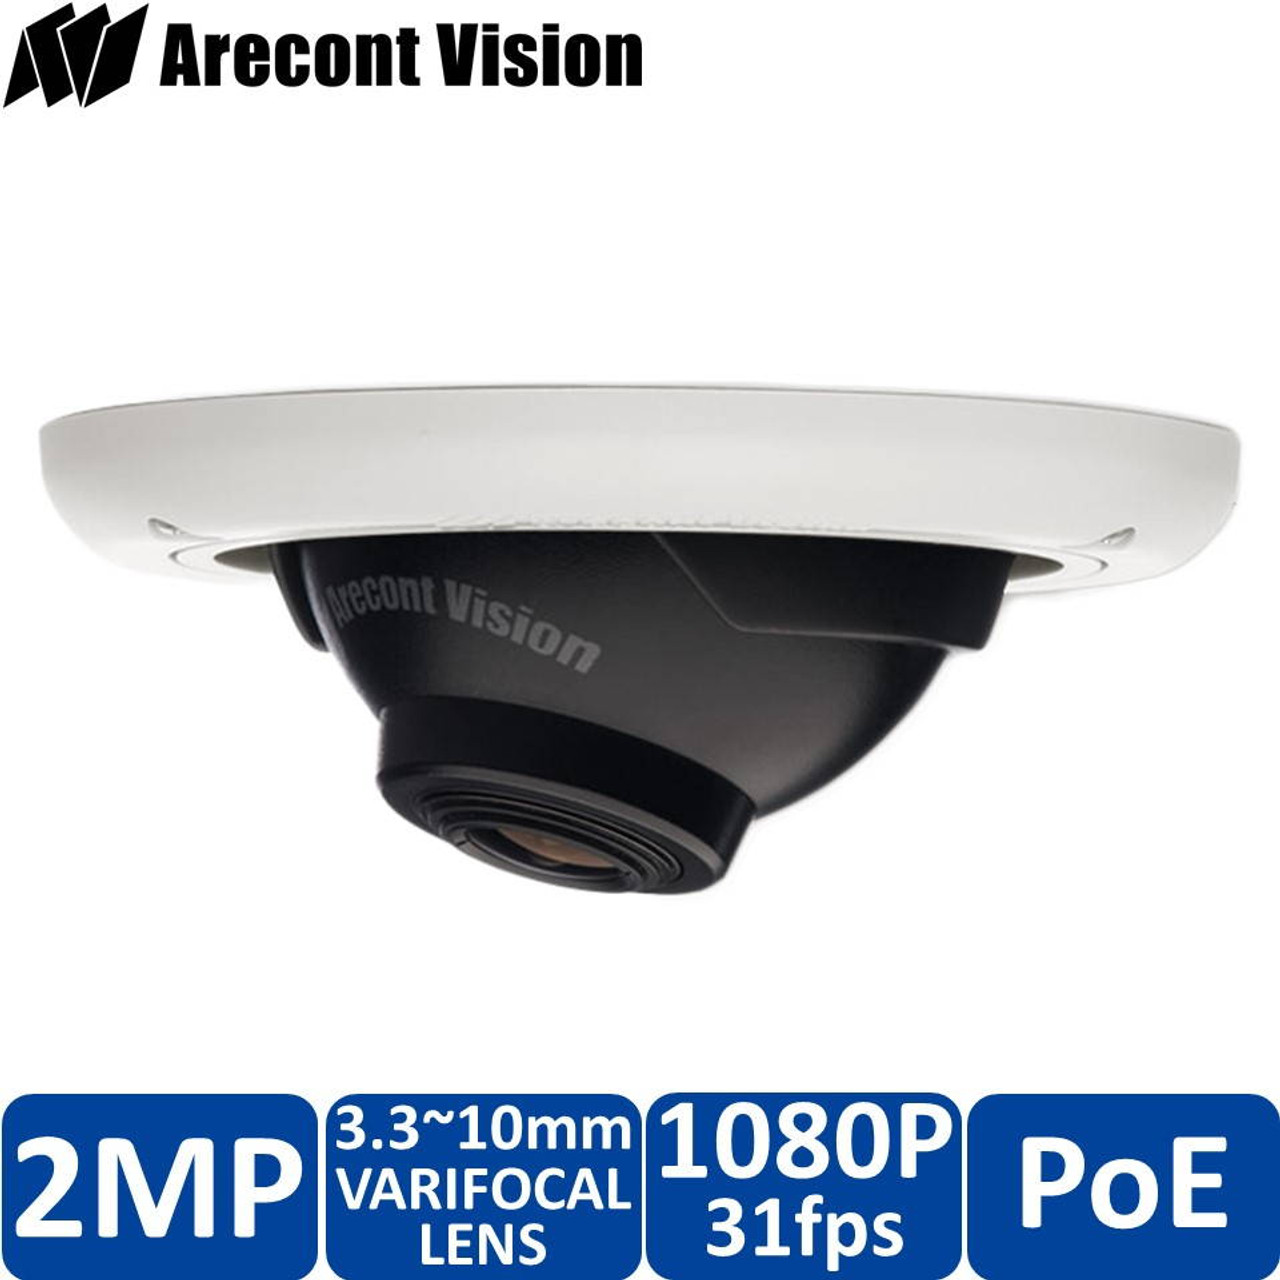 ARECONT VISION AV2146DN-3310-D-LG IP CAMERA DRIVER DOWNLOAD